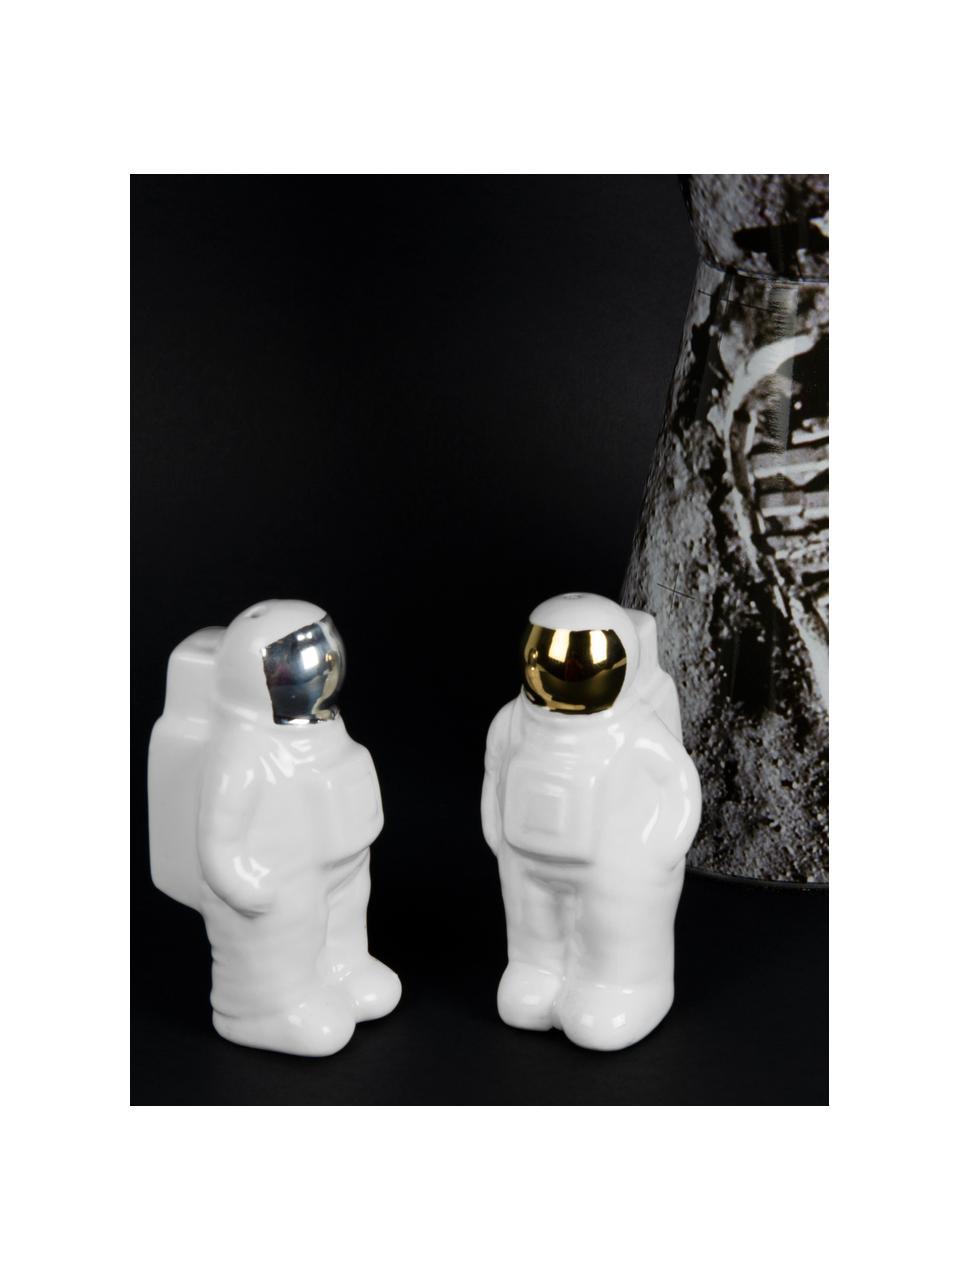 Set saliera e pepiera Astronaut 2 pz, Porcellana, Bianco, argentato, dorato, Larg. 6 x Alt. 9 cm